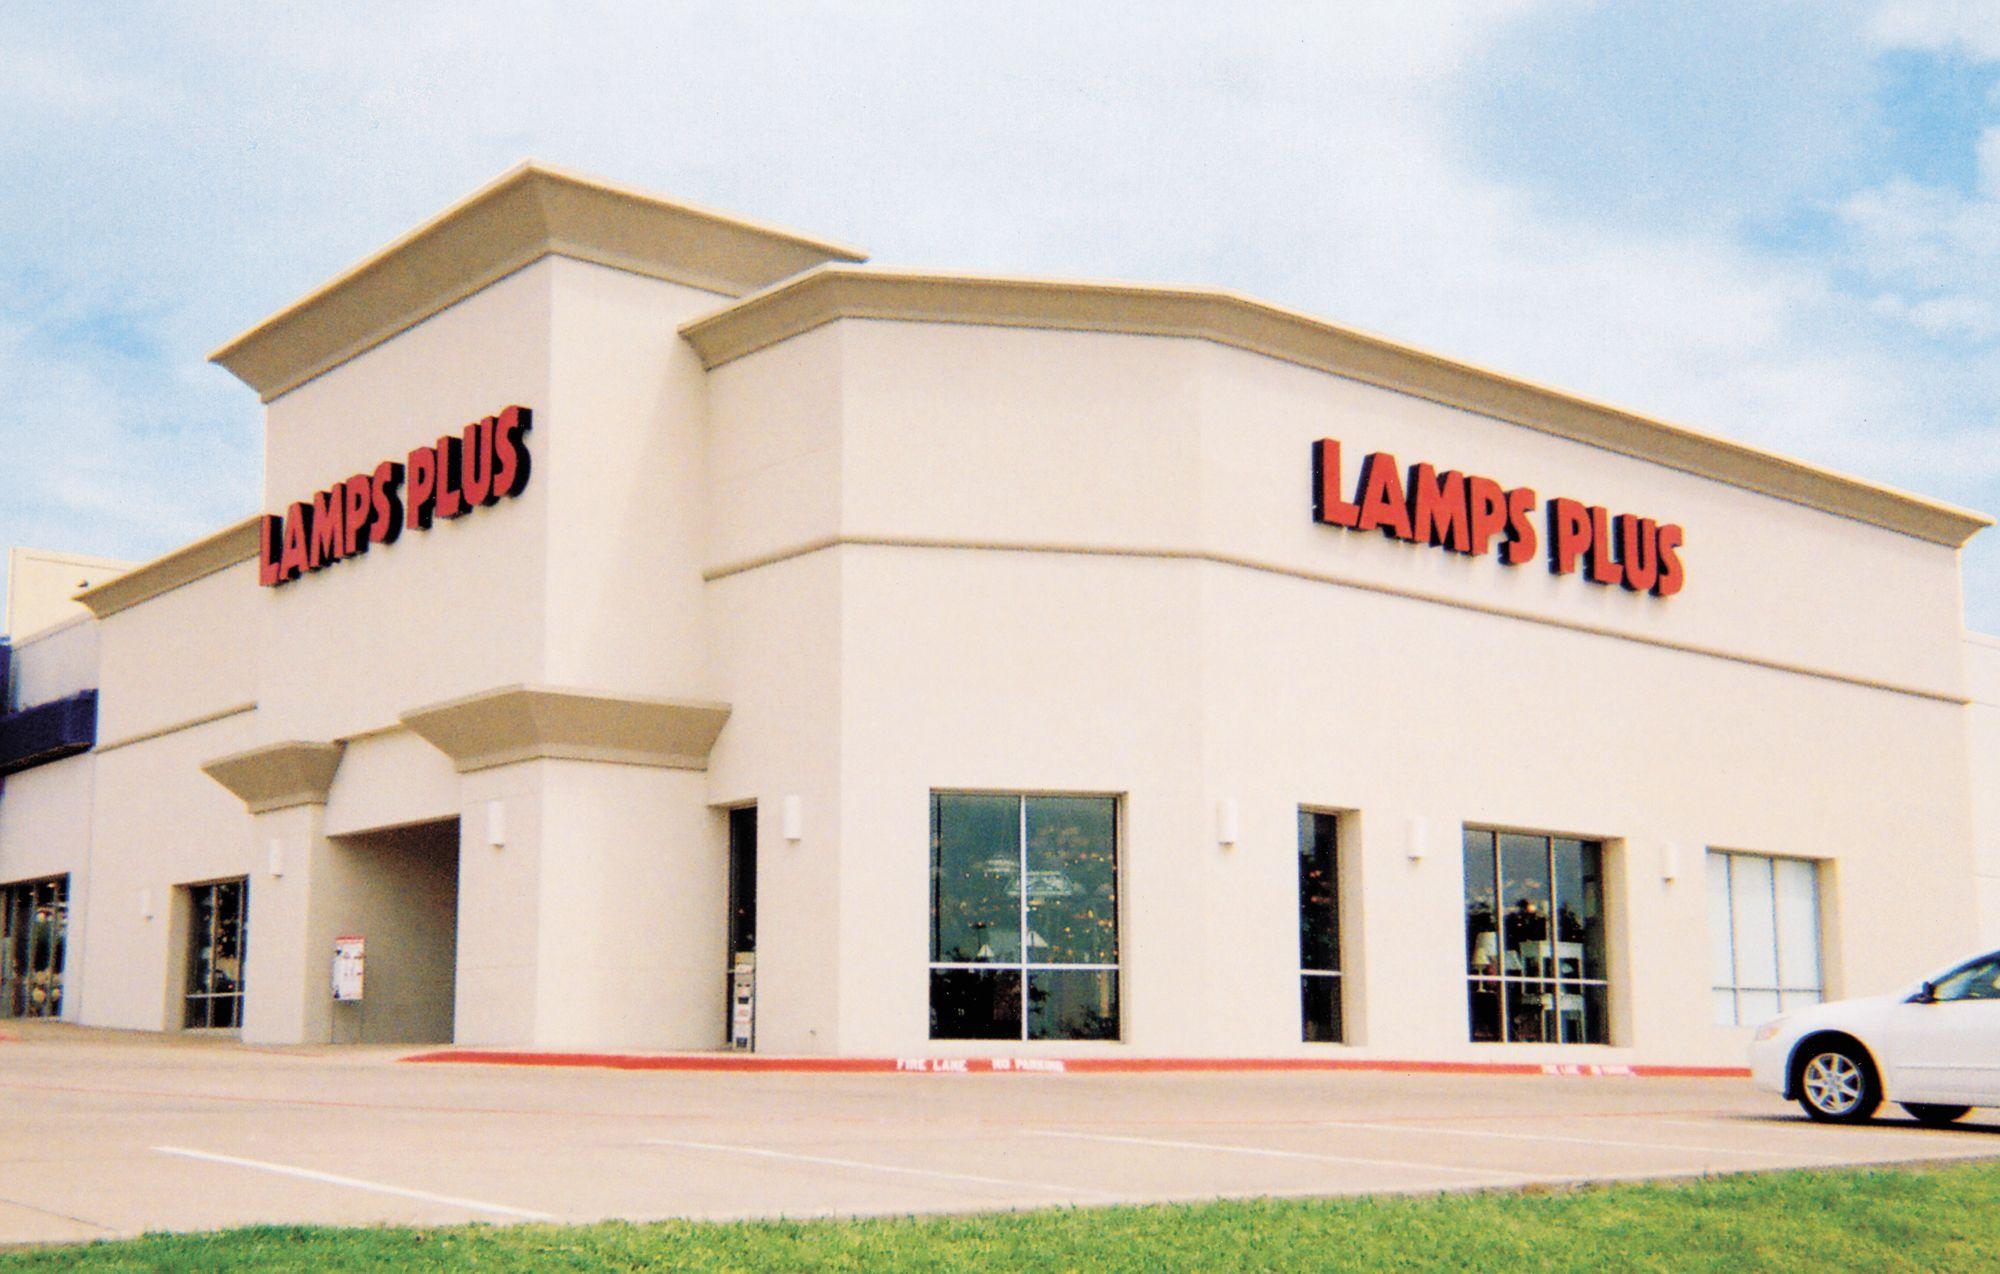 lamps plus - texas lighting stores, dallas - ft. worth, tx, lamp